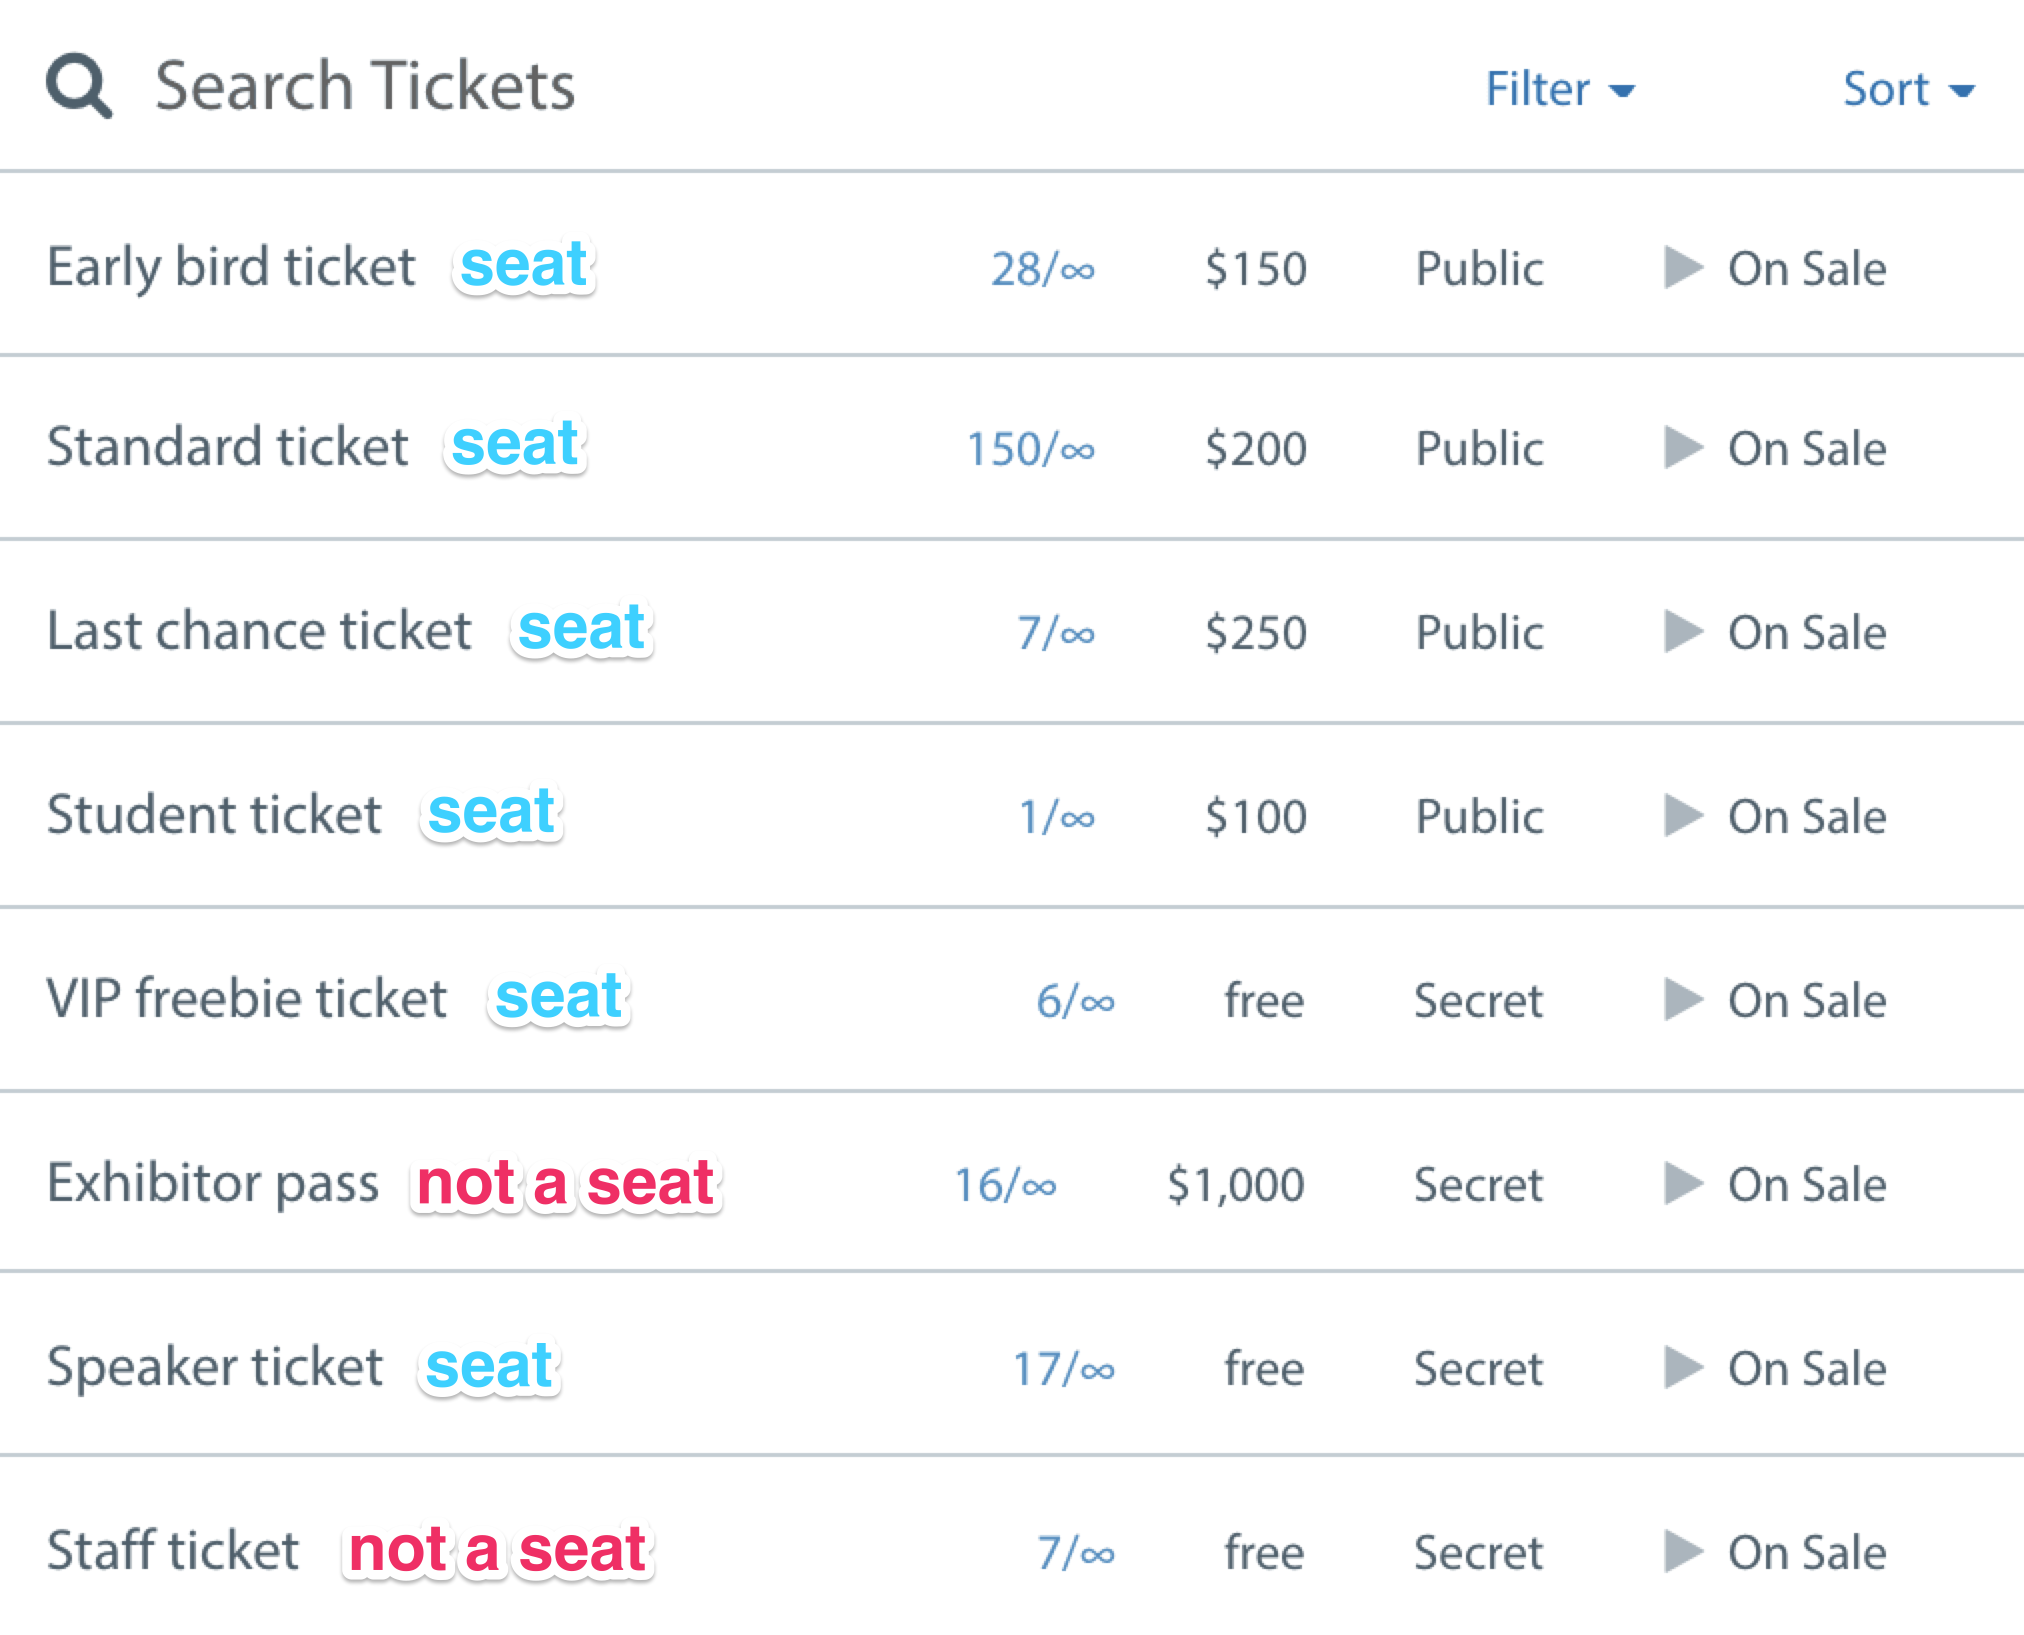 seat vs not seat